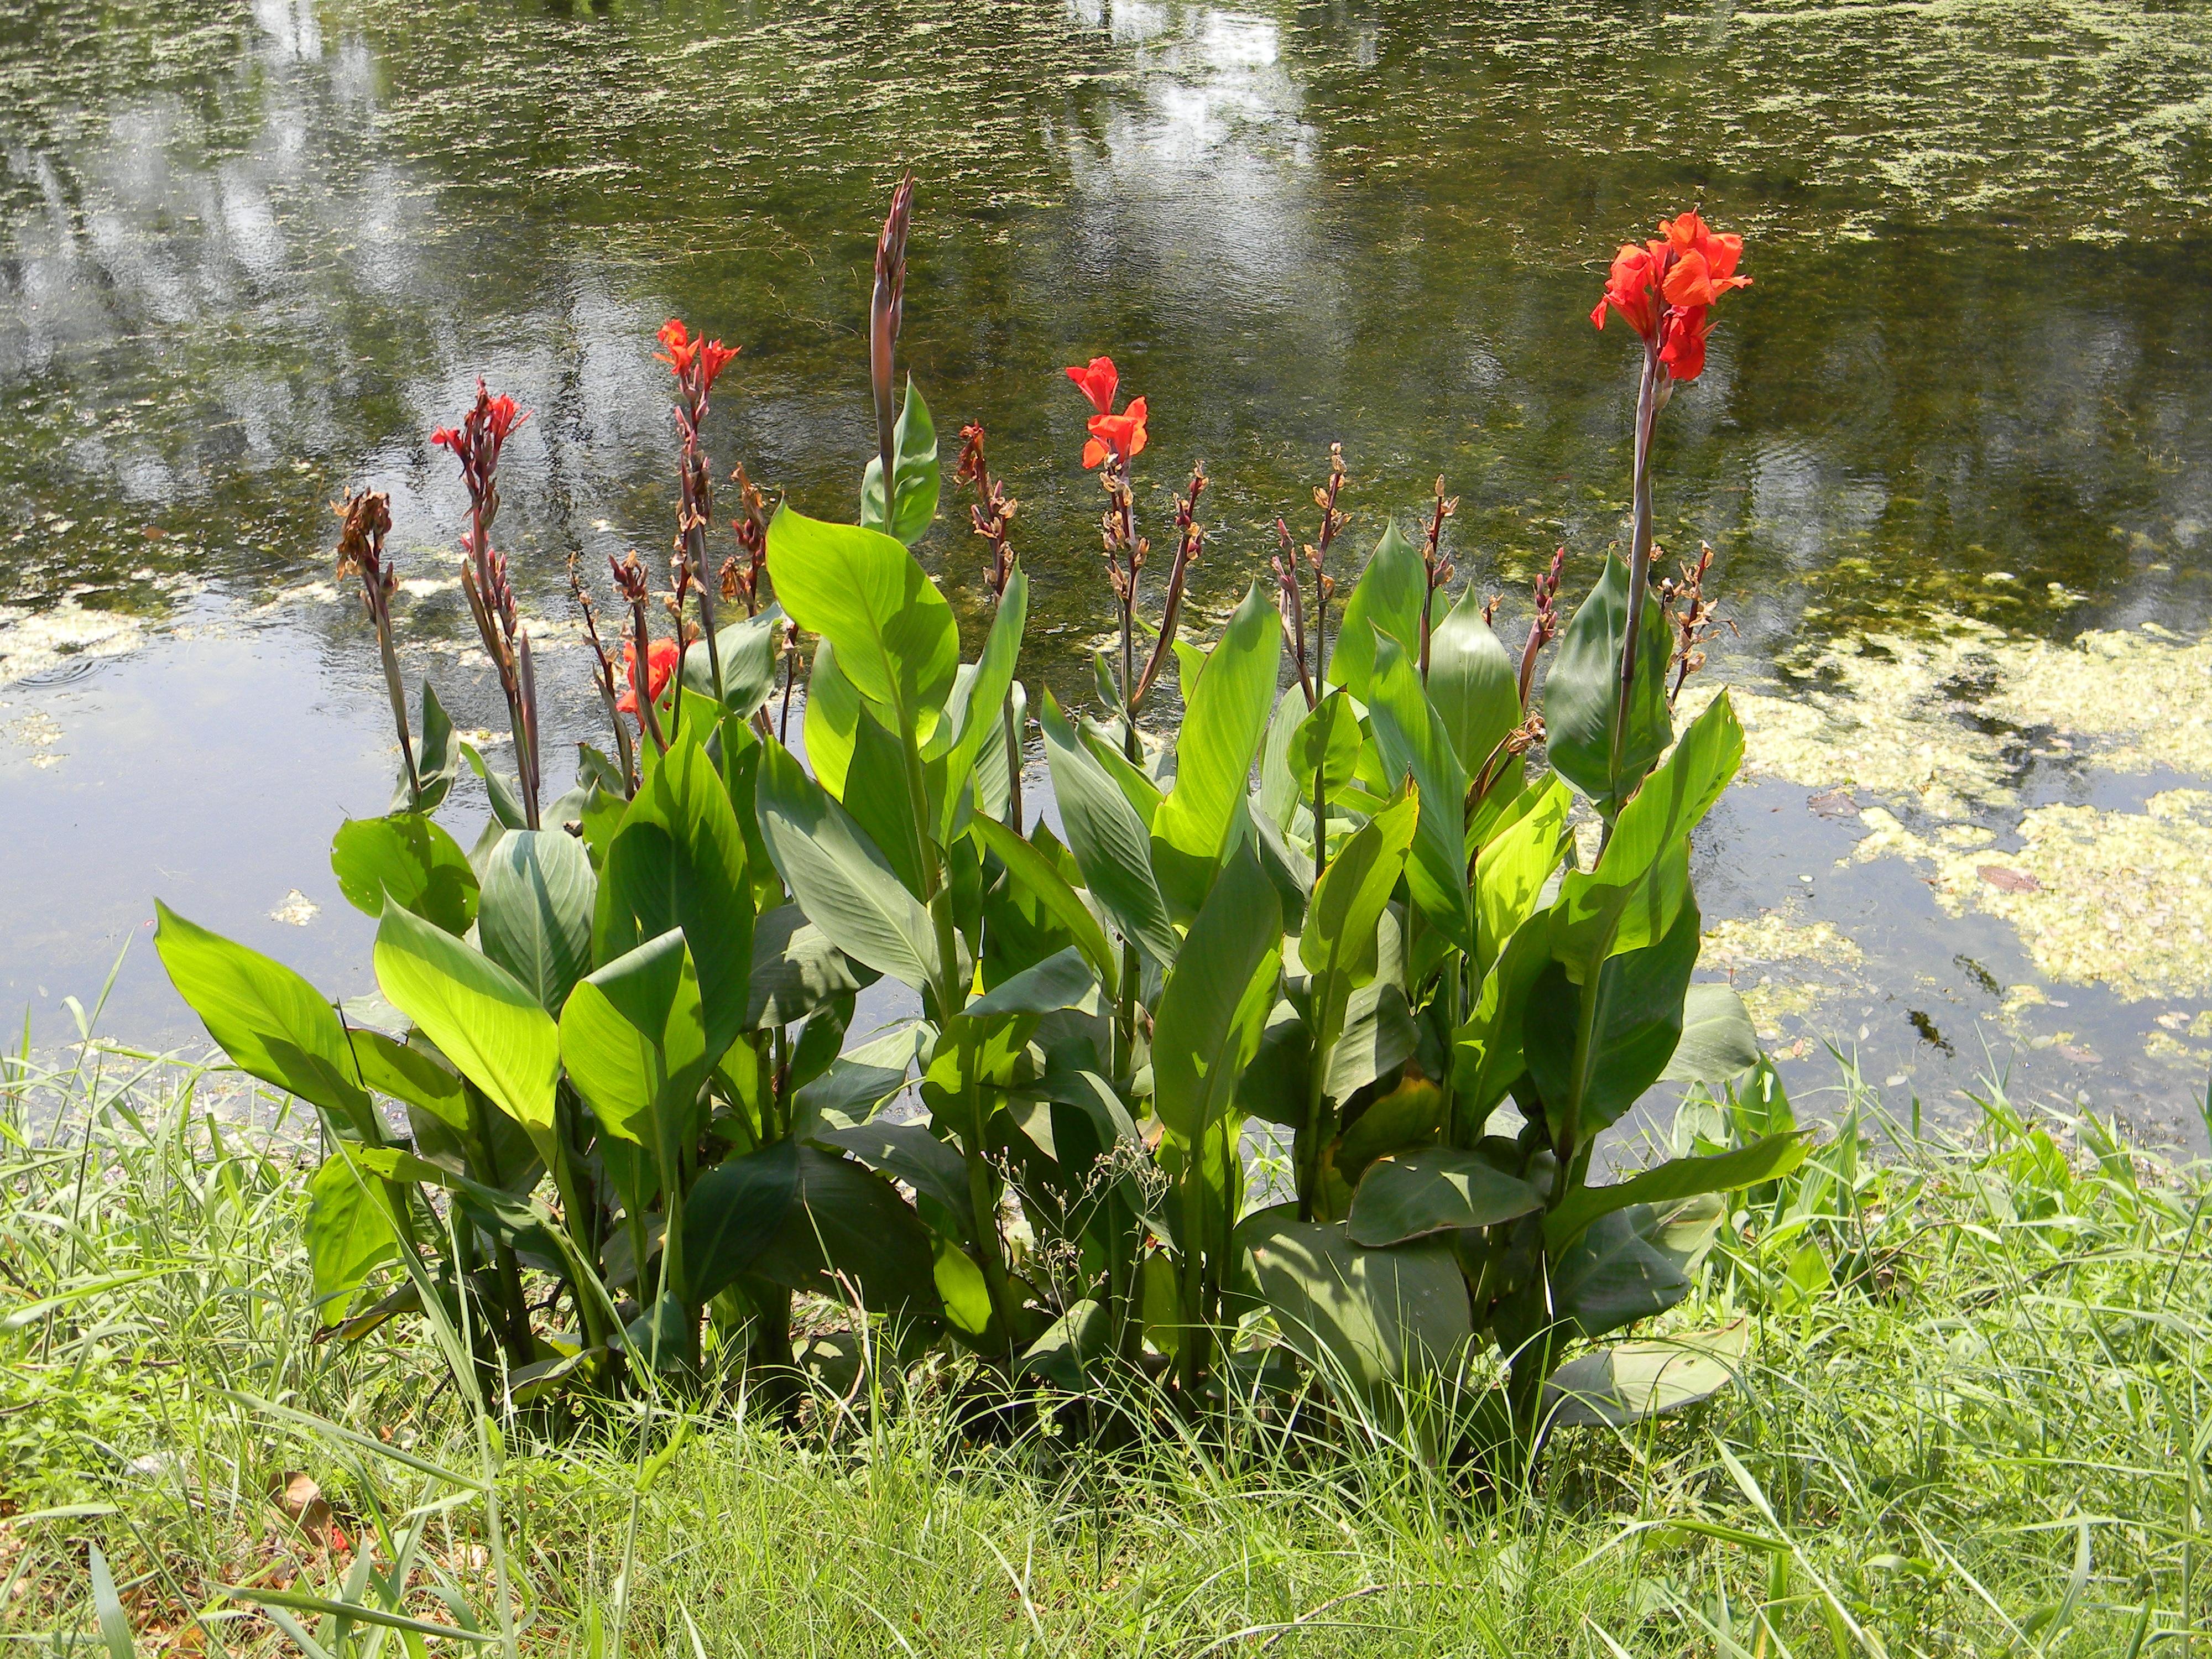 Www Jardin Et Decoration Be Floralux Dadizele Flandre Occidentale Htlm